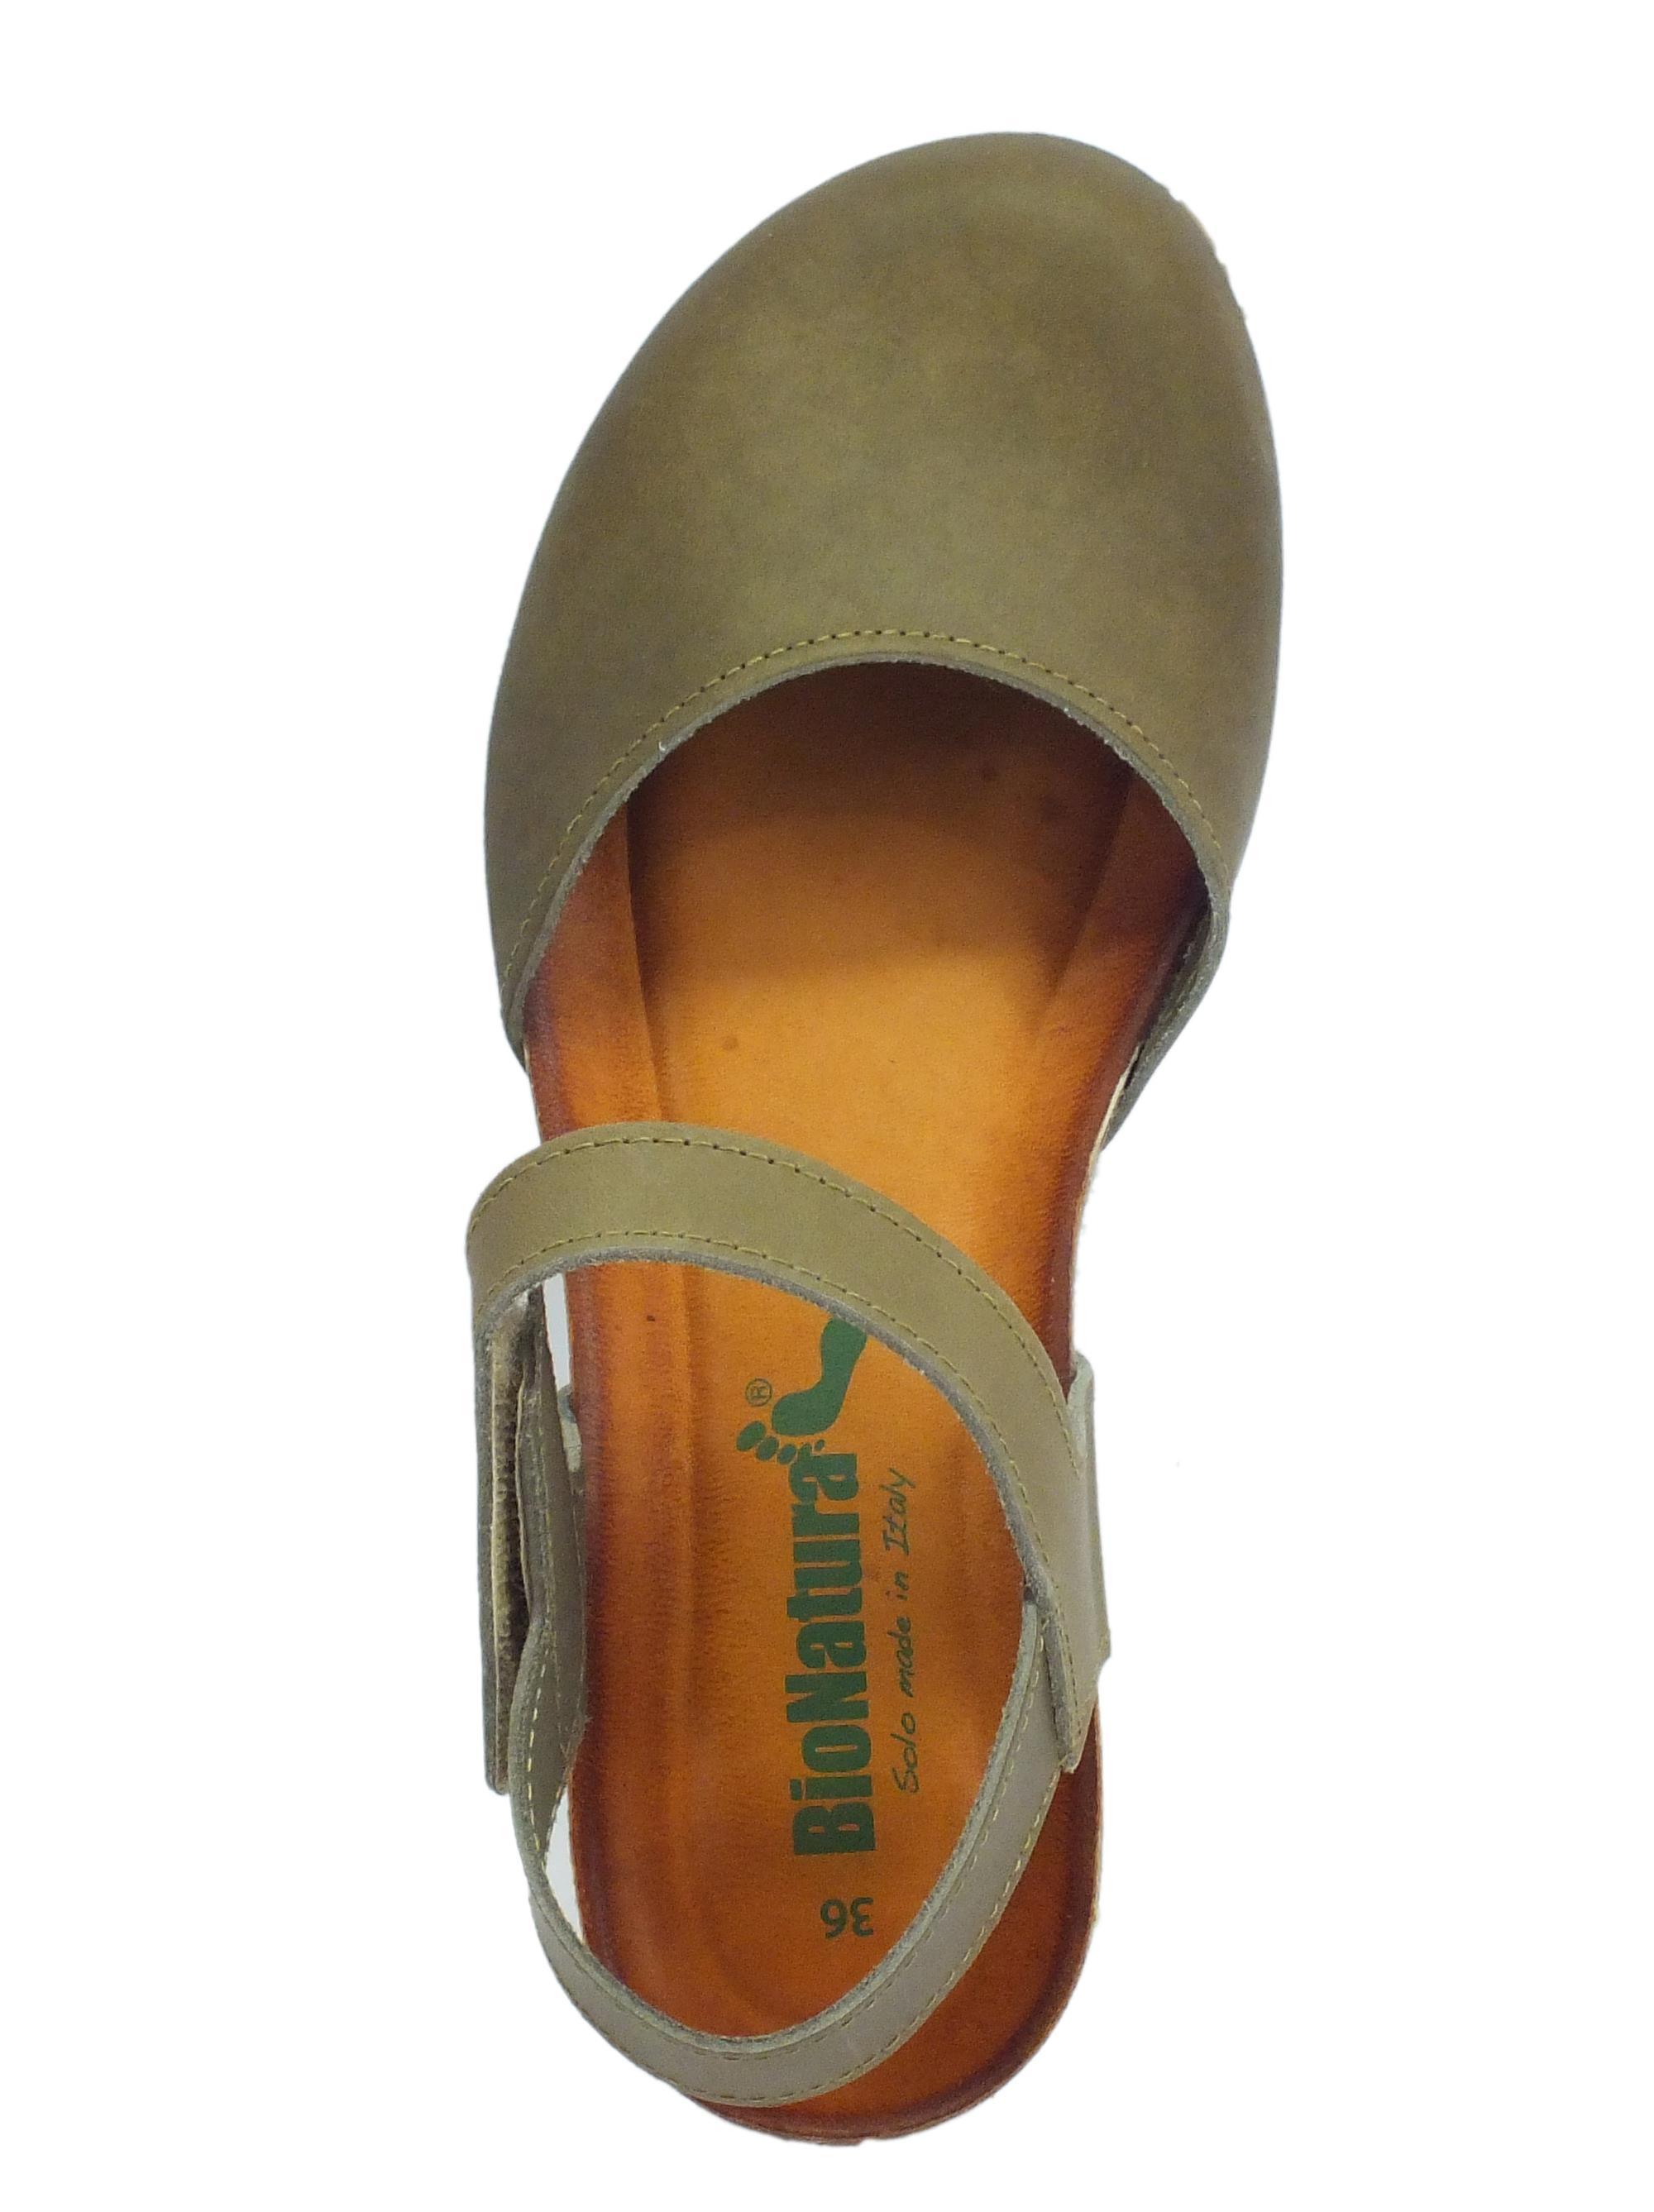 finest selection 25041 7c1b5 BioNatura 68 C 2081 IMB Pelle Gaucho Fango sandali chiusi in pelle zeppa  bassa